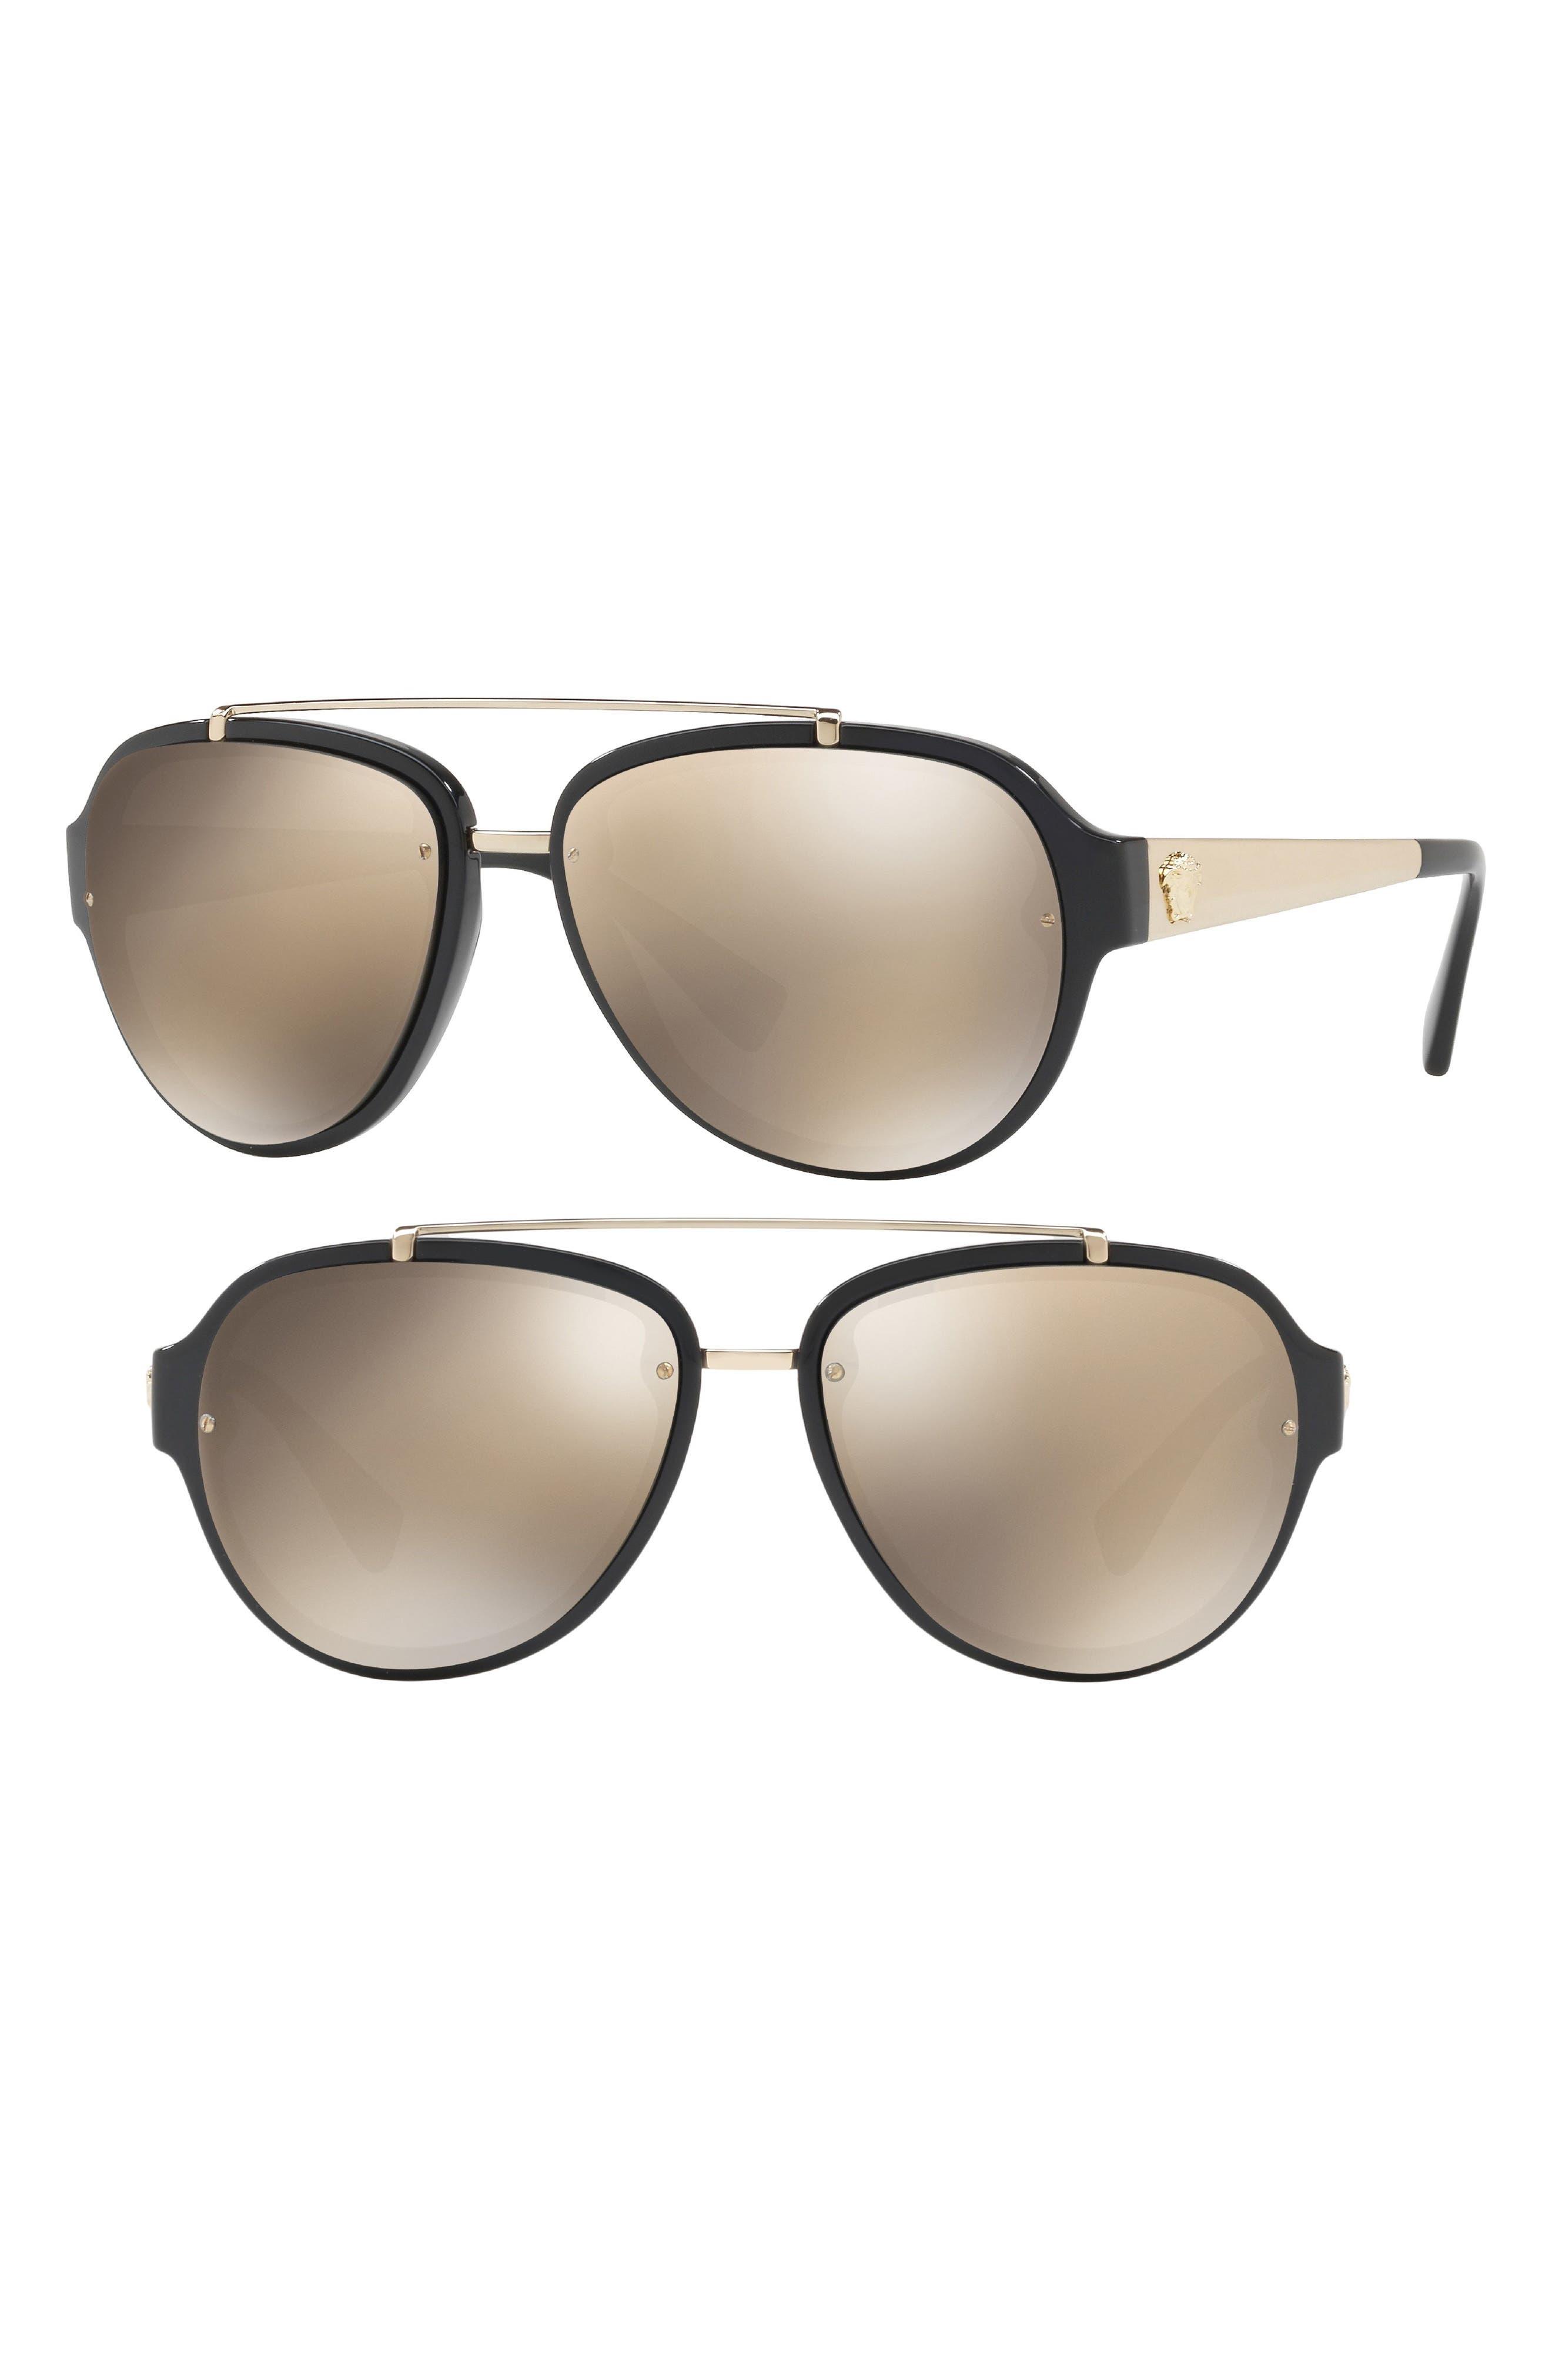 57mm Aviator Sunglasses,                         Main,                         color, BLACK/ BROWN